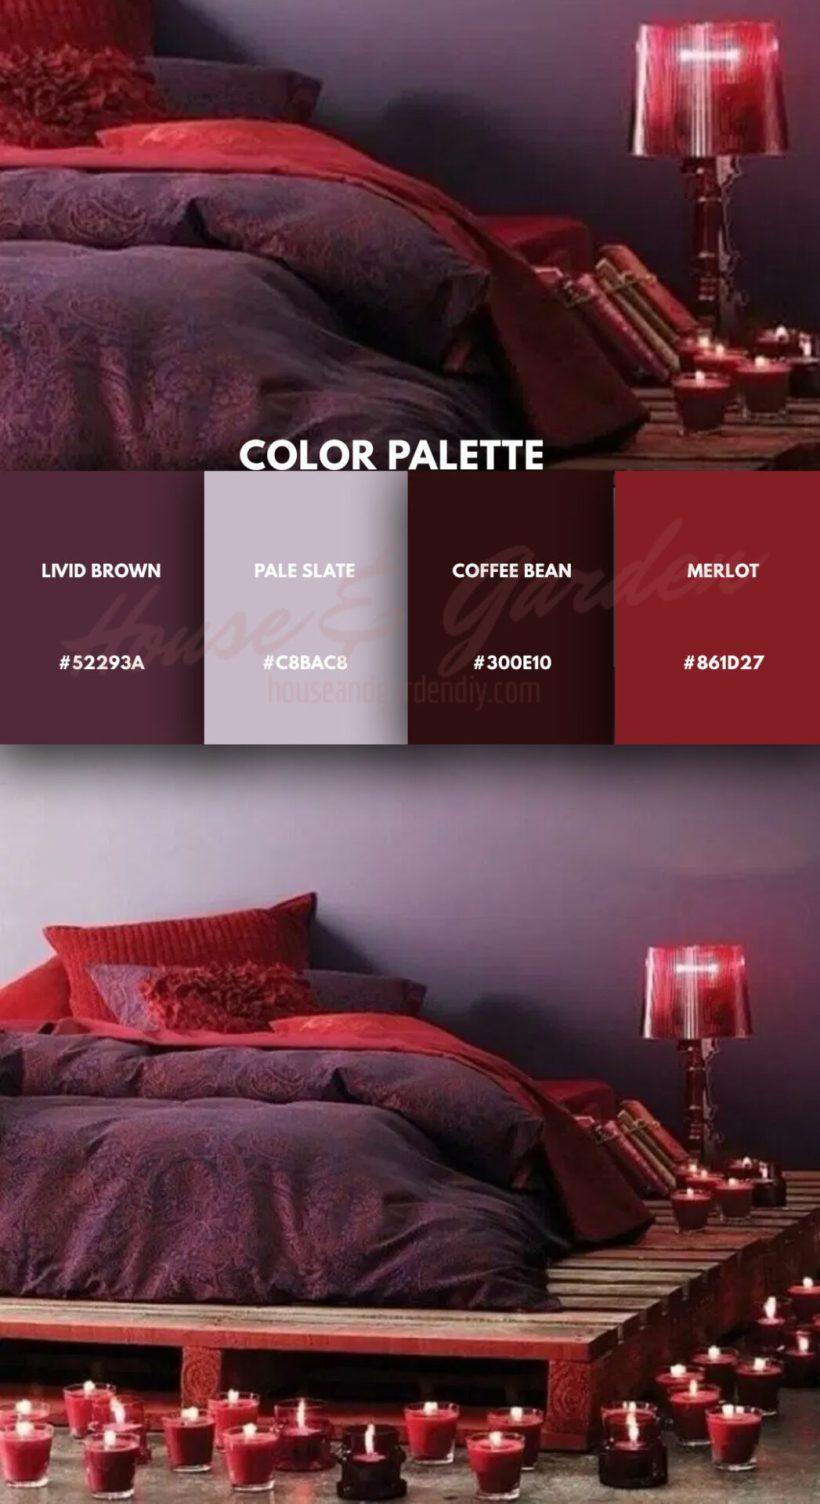 Bedroom Decor Ideas simple